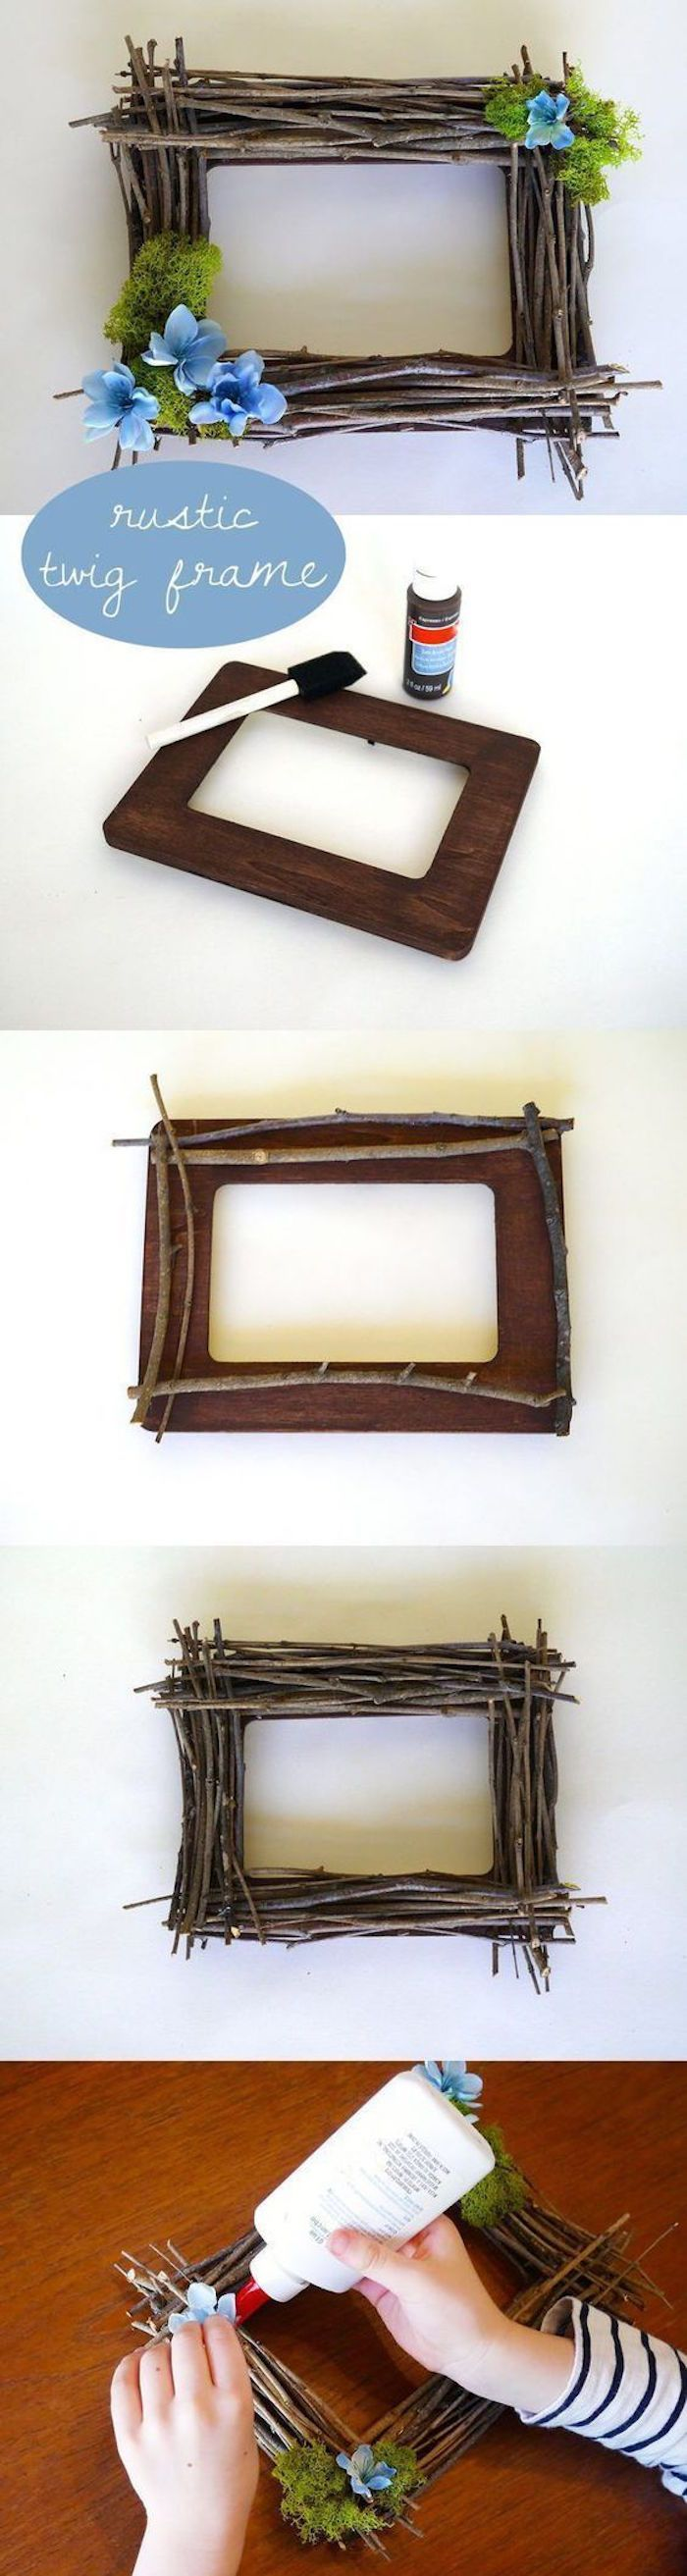 DIY Deko Idee, Rahmen Aus Holz Basteln